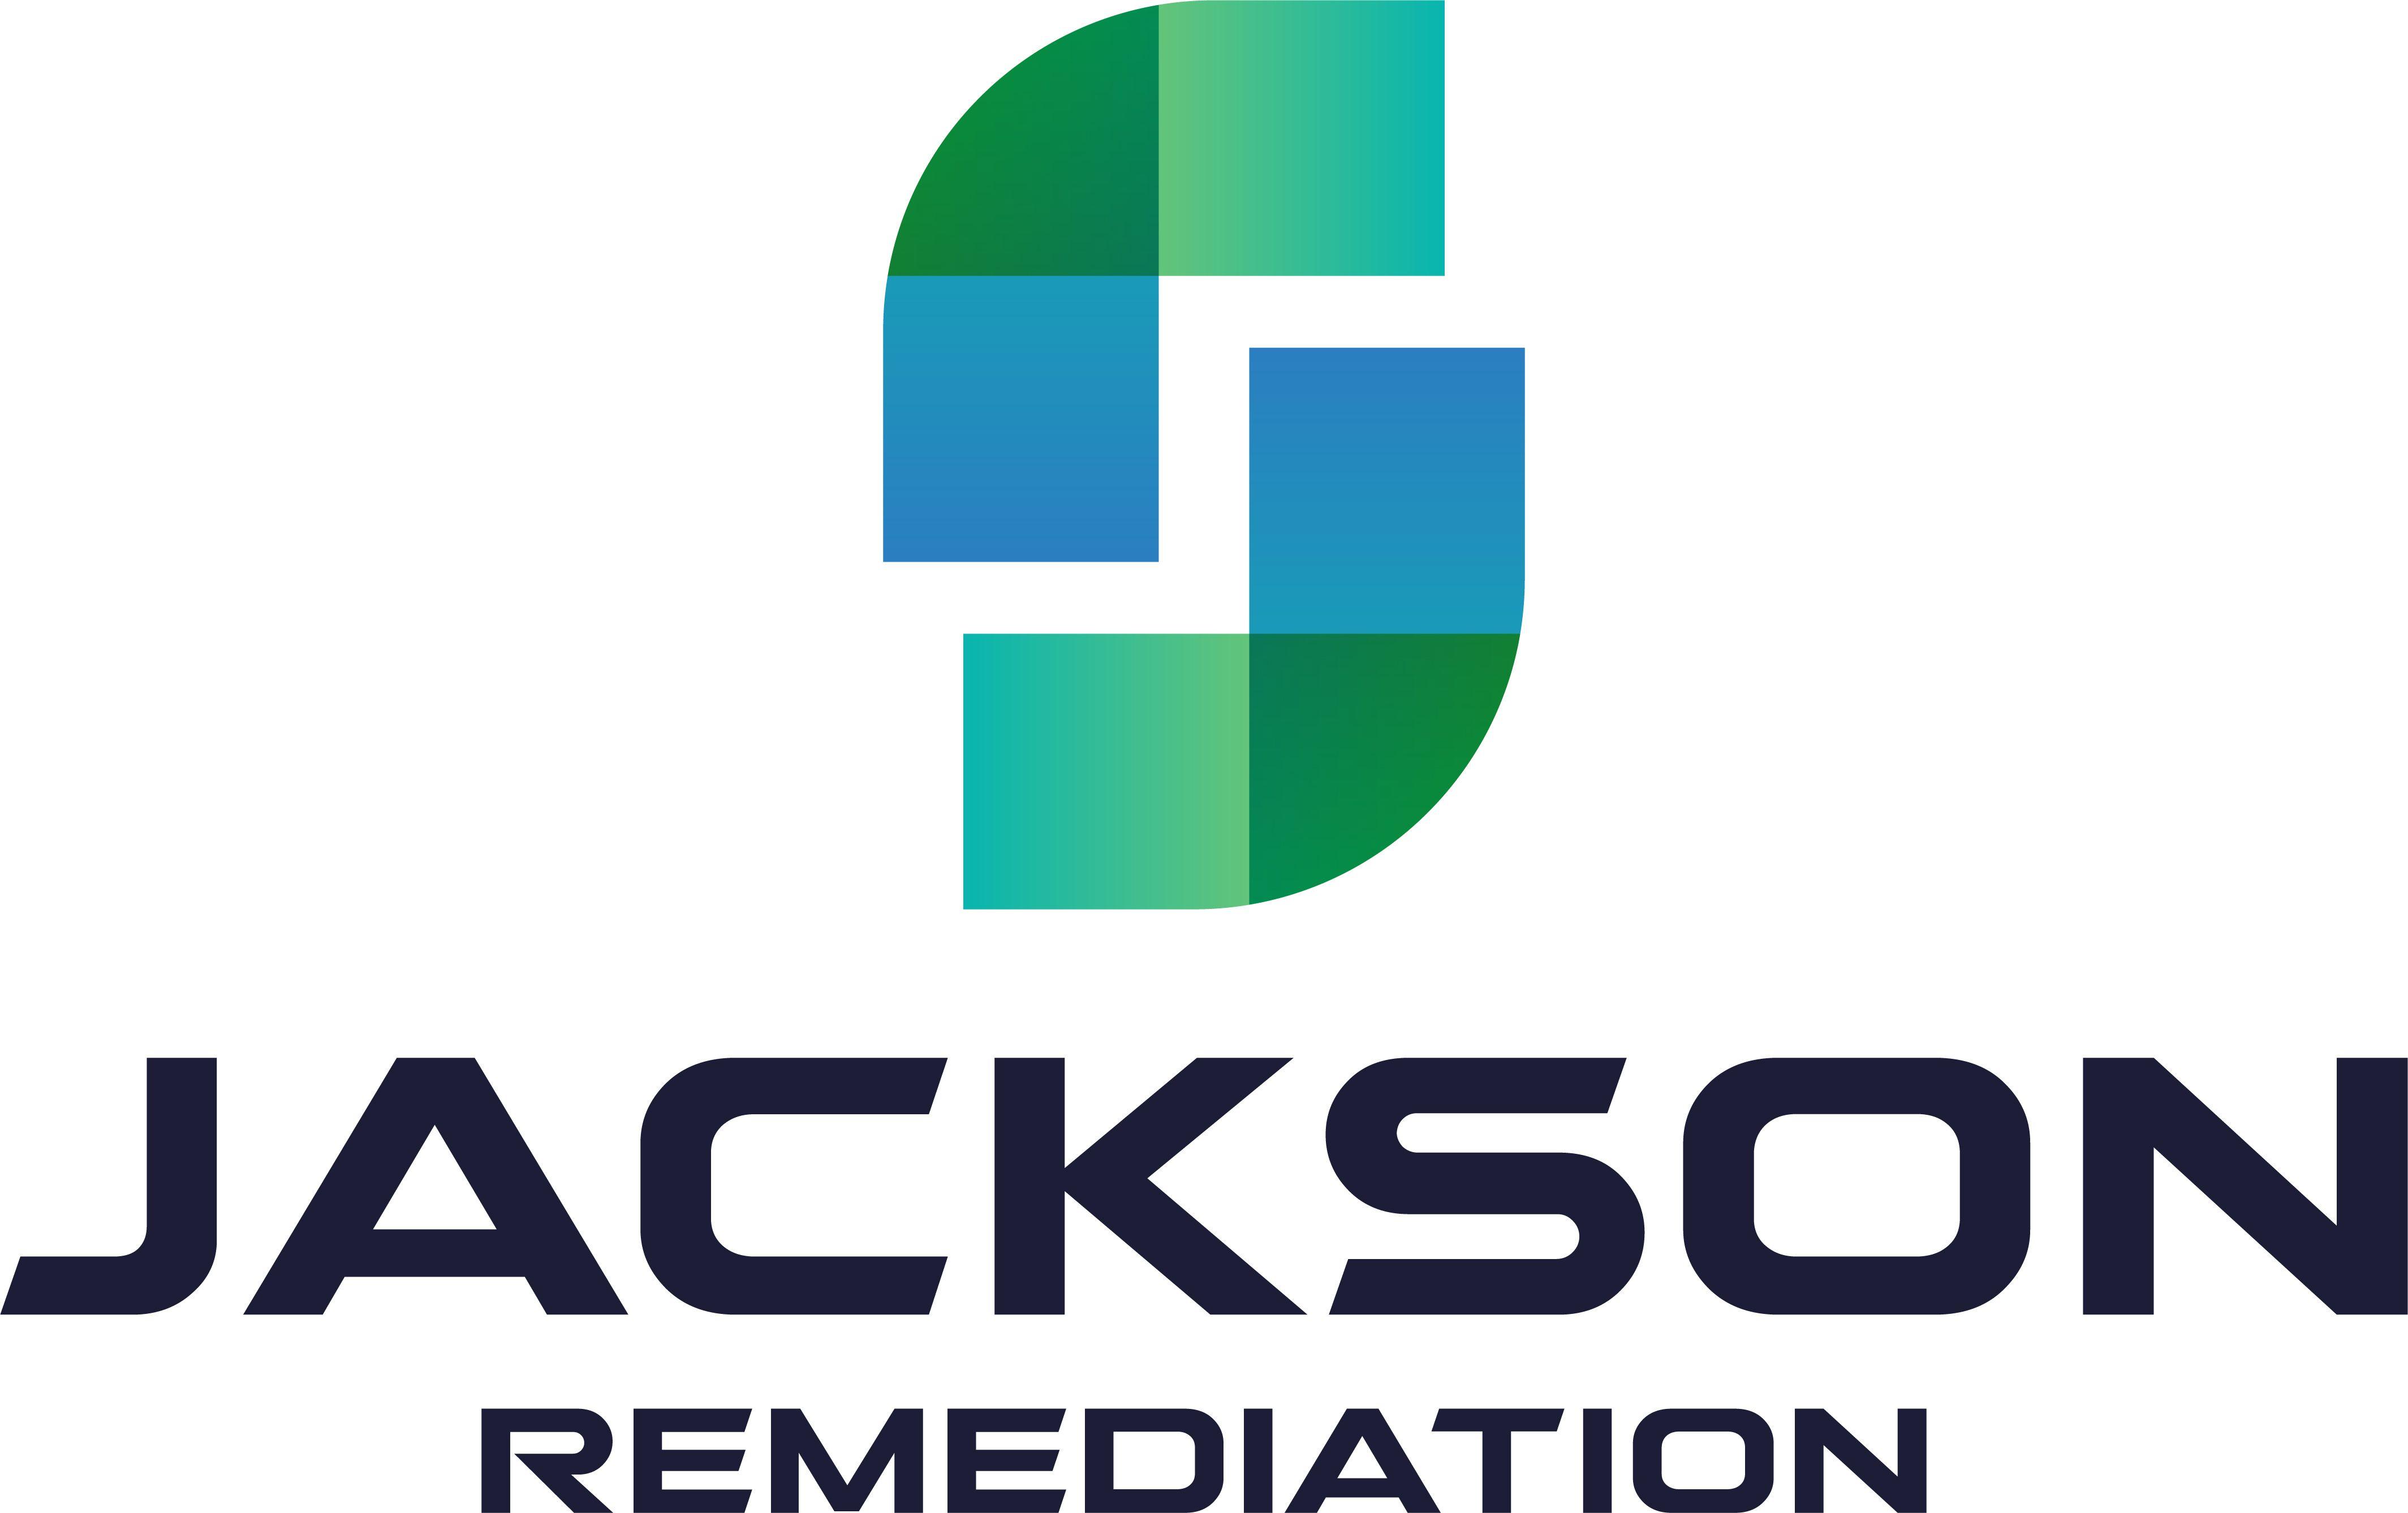 Jackson Remediation